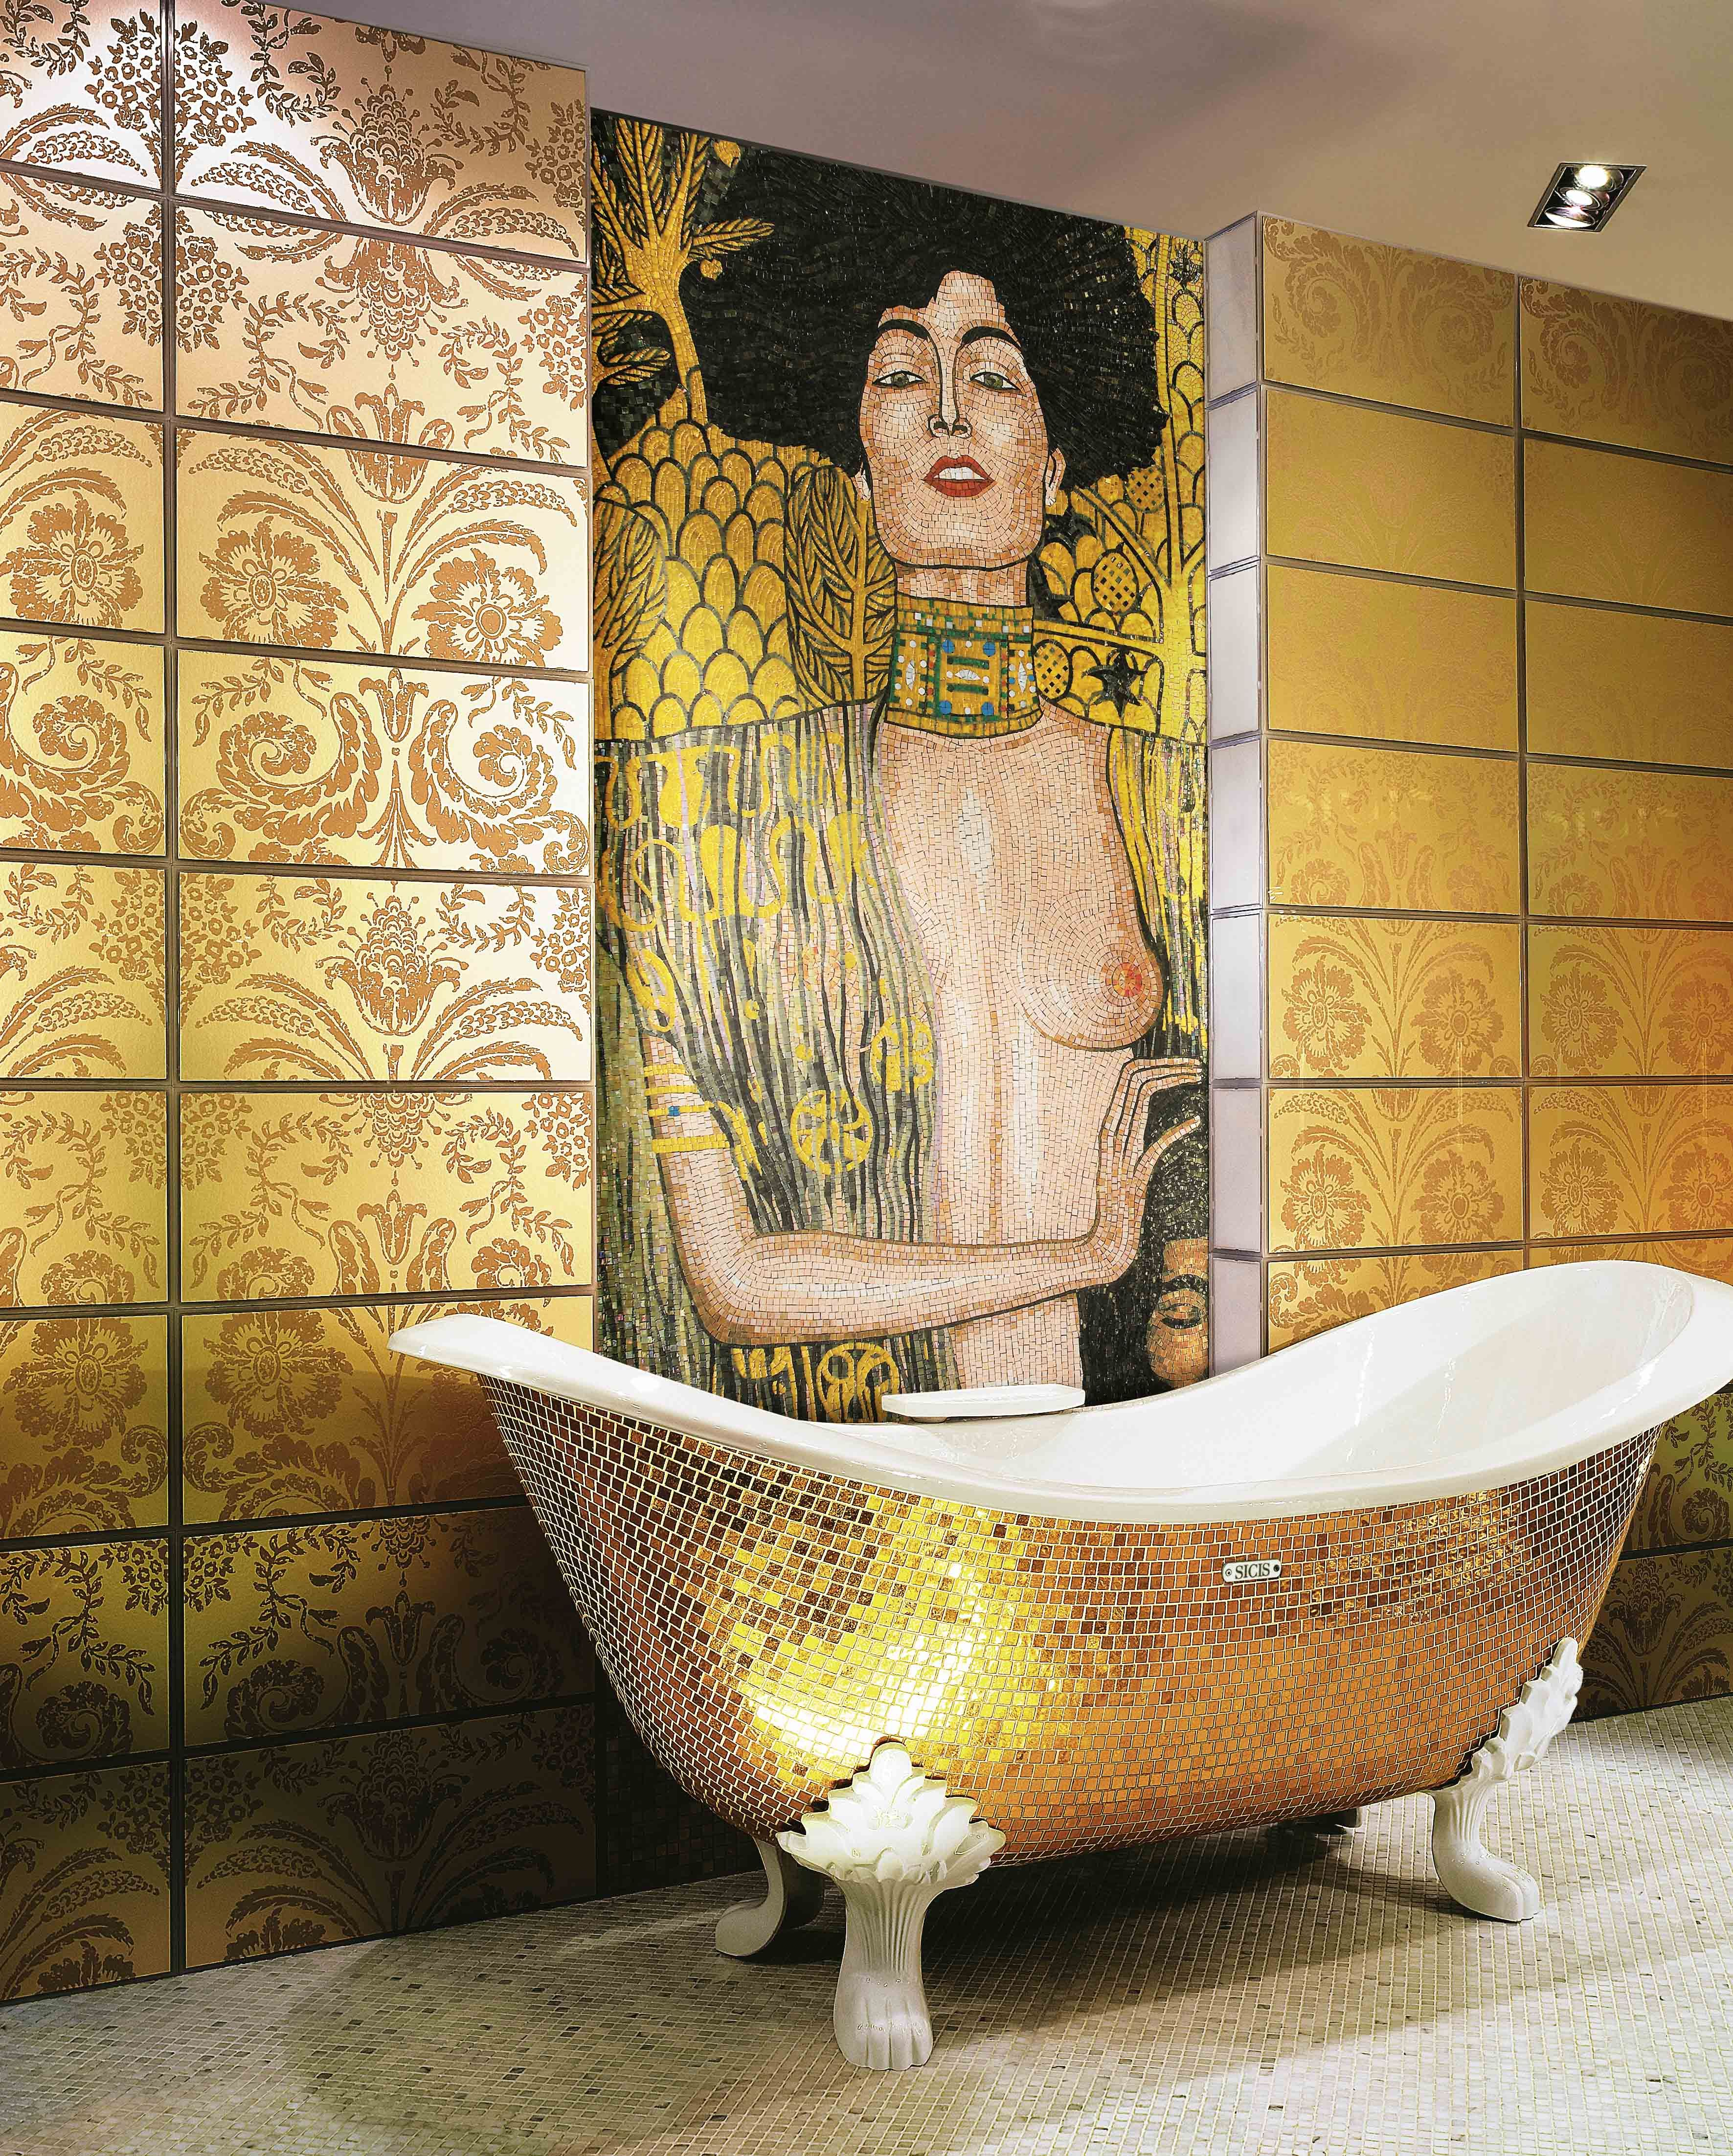 Miroir Salle De Bain Siehr ~ D Coration Int Rieure Salle De Bain Bathroom Gold Dor Or